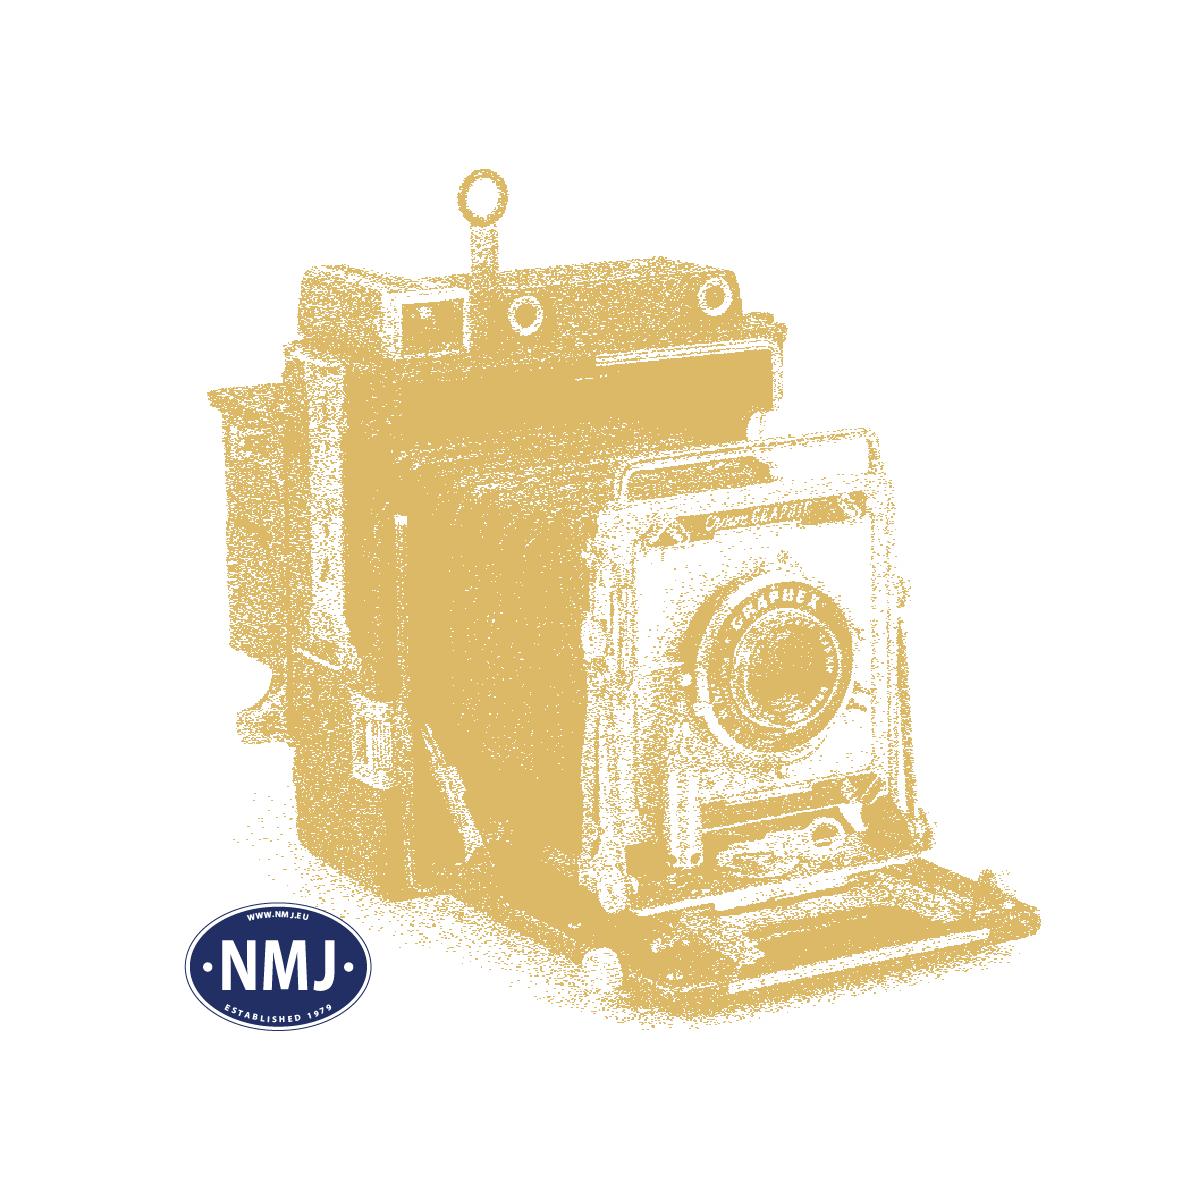 NMJT90401 - NMJ Topline 202020 Diesellok der SNCB, DCC m/ Sound